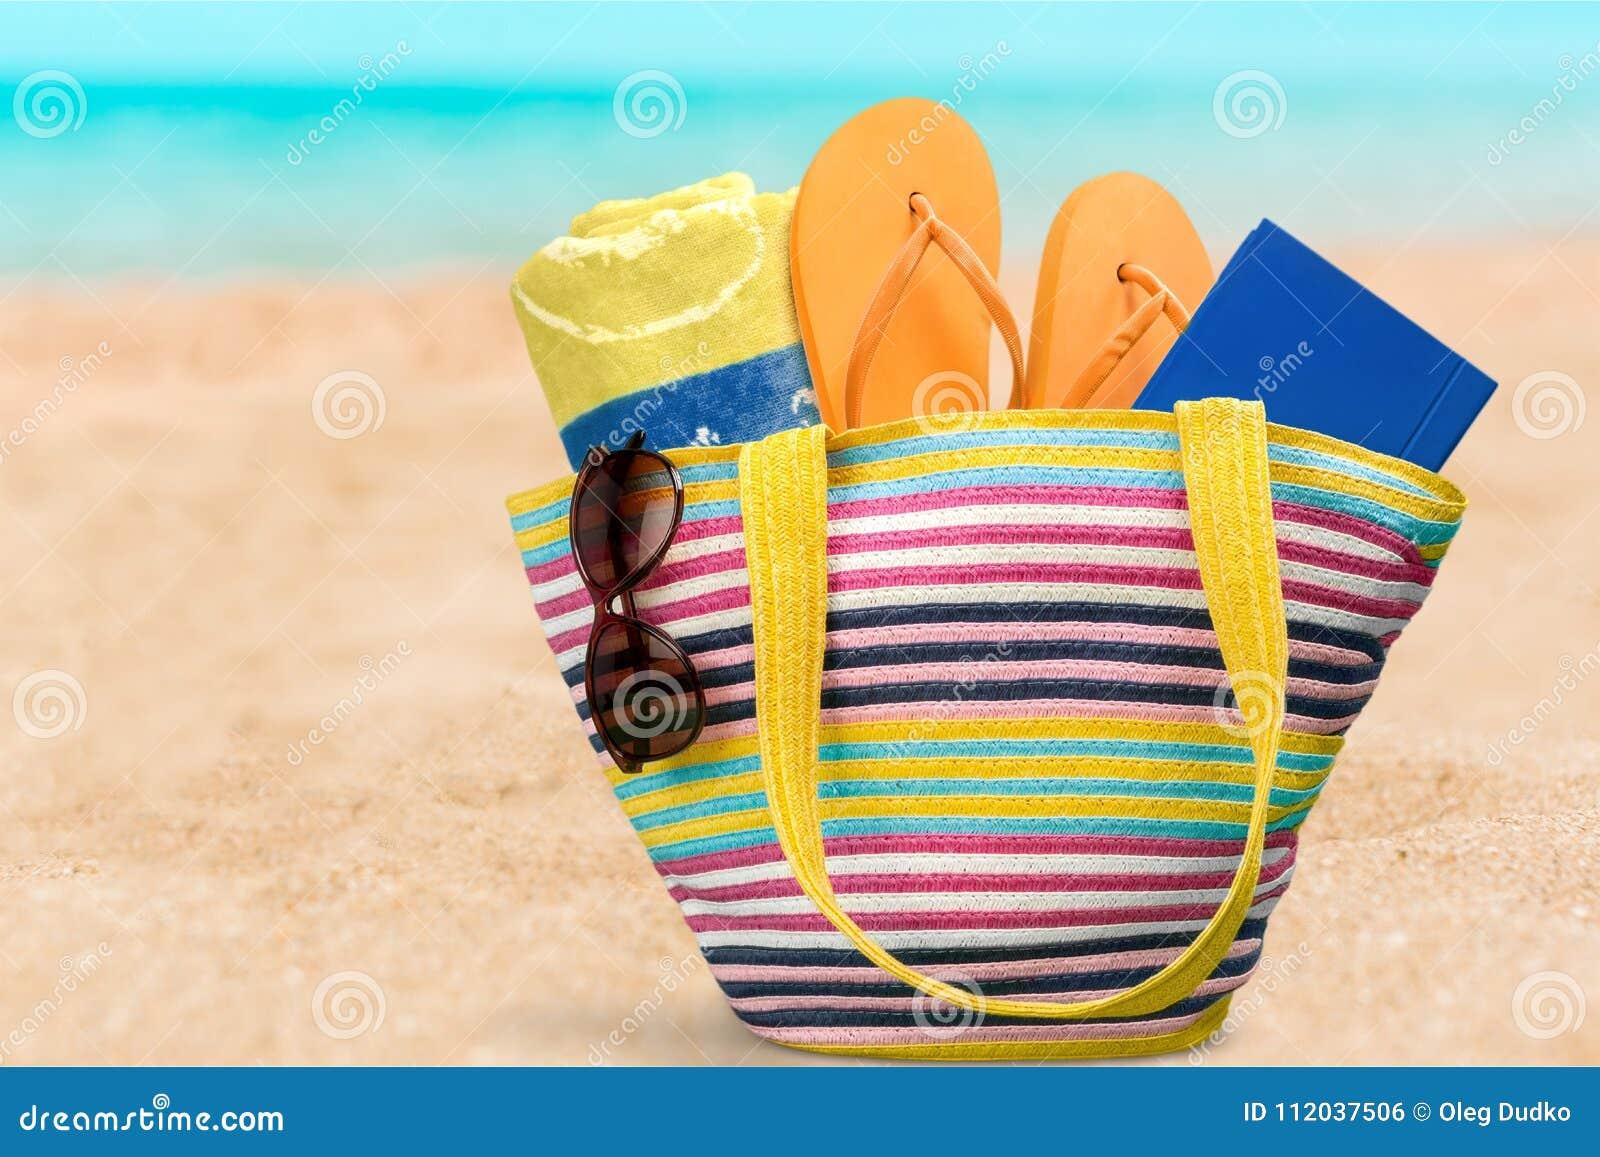 4eaf5e658 Beach Bag On Sand Of Tropical Beach Stock Photo - Image of towel ...